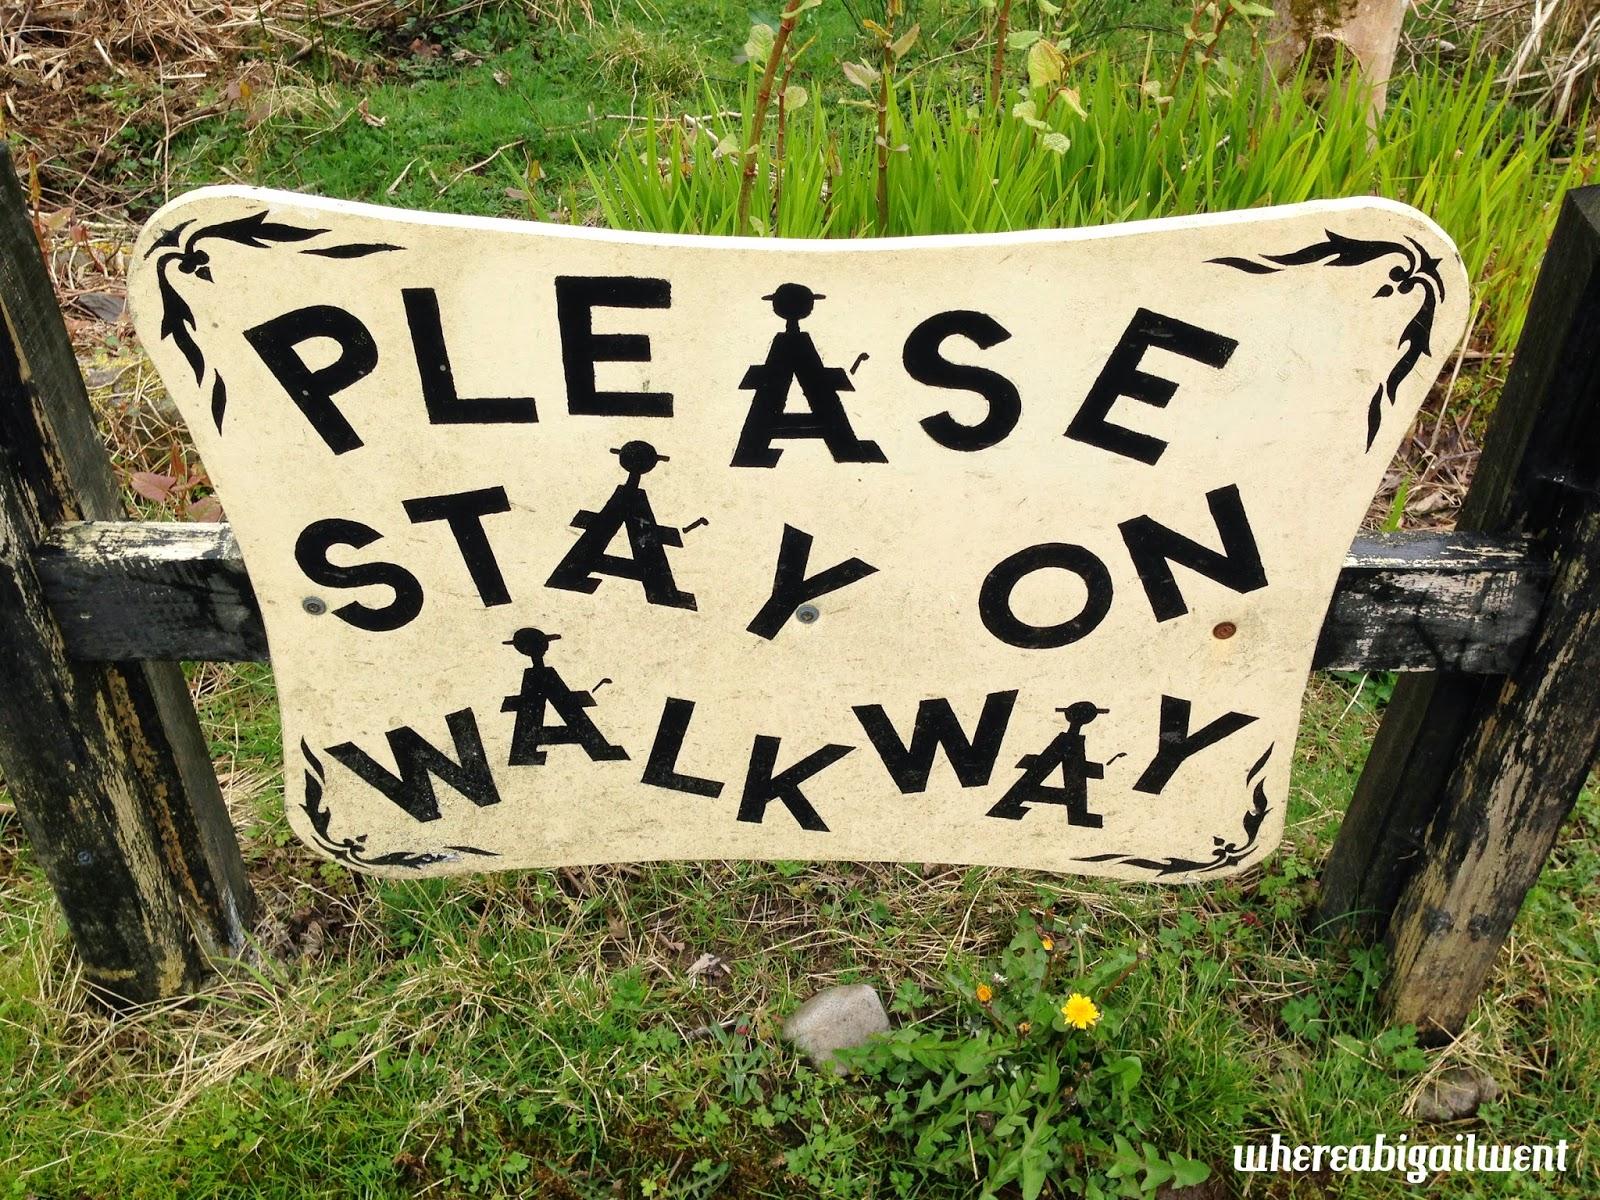 Please Stay on Walkway